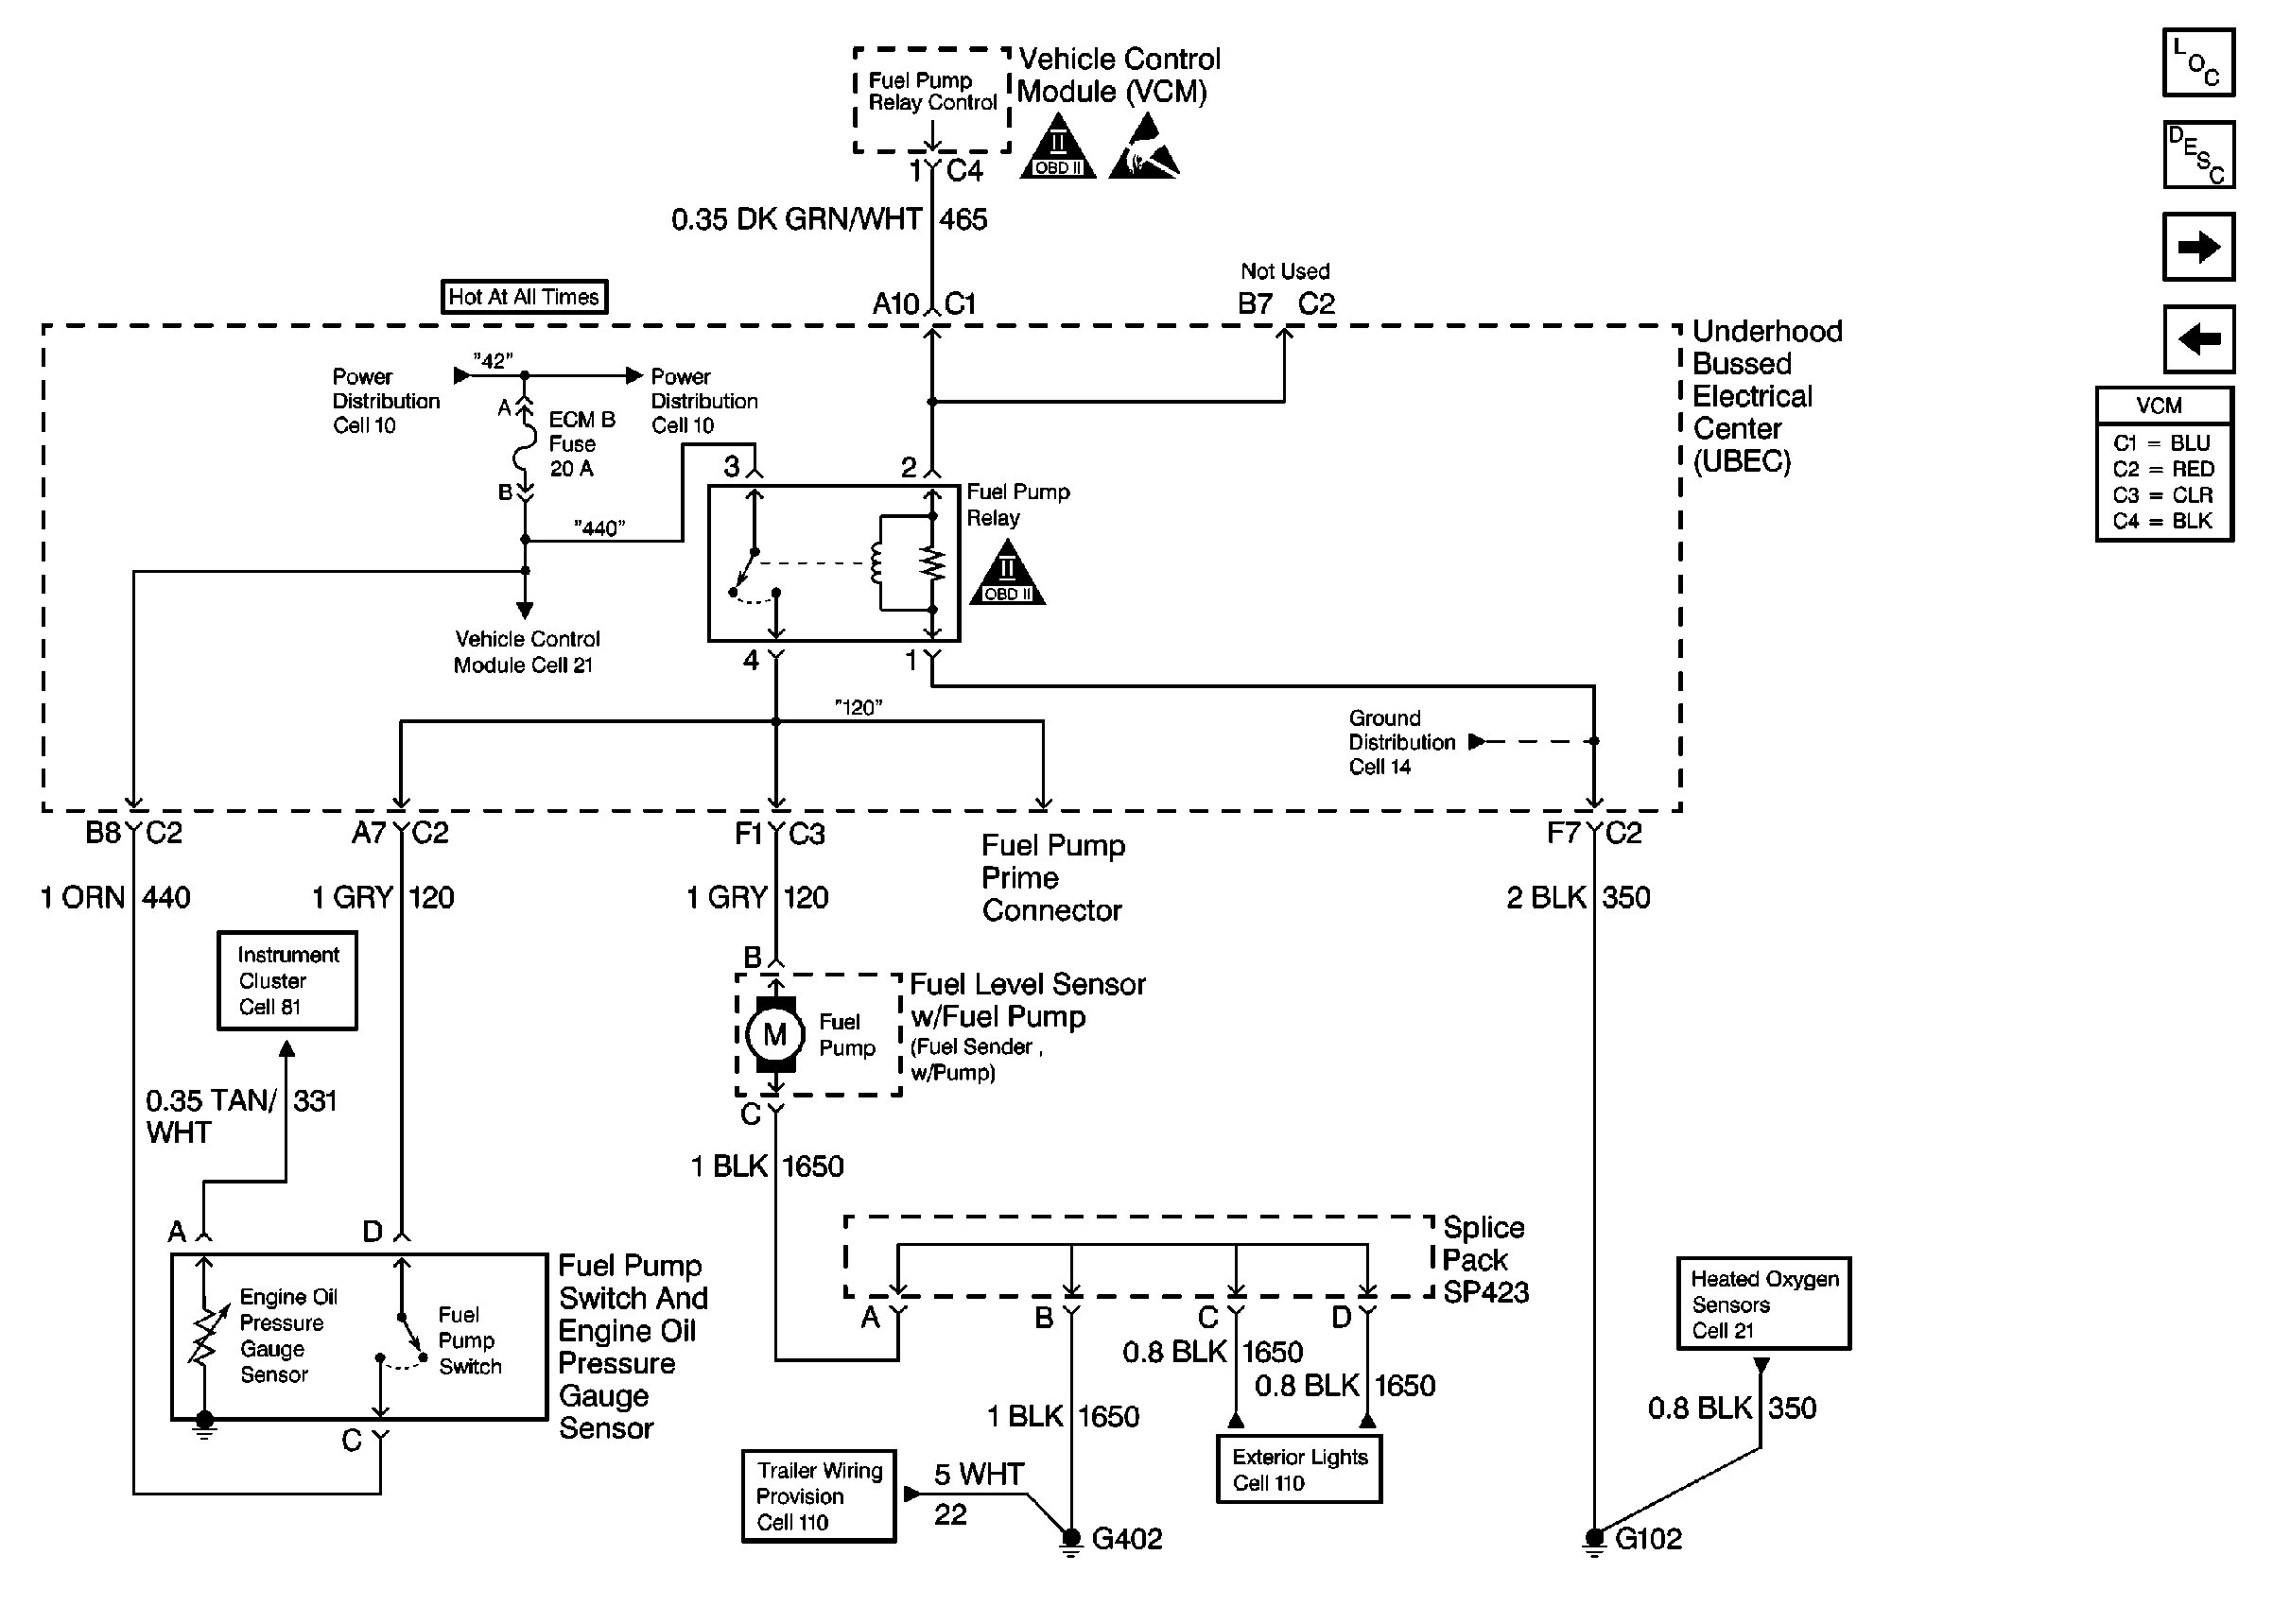 s10 ignition switch wiring diagram wiring diagram image rh mainetreasurechest com 1991 Chevy S10 Wiring Diagram 2000 Chevy S10 Radio Wiring Diagram